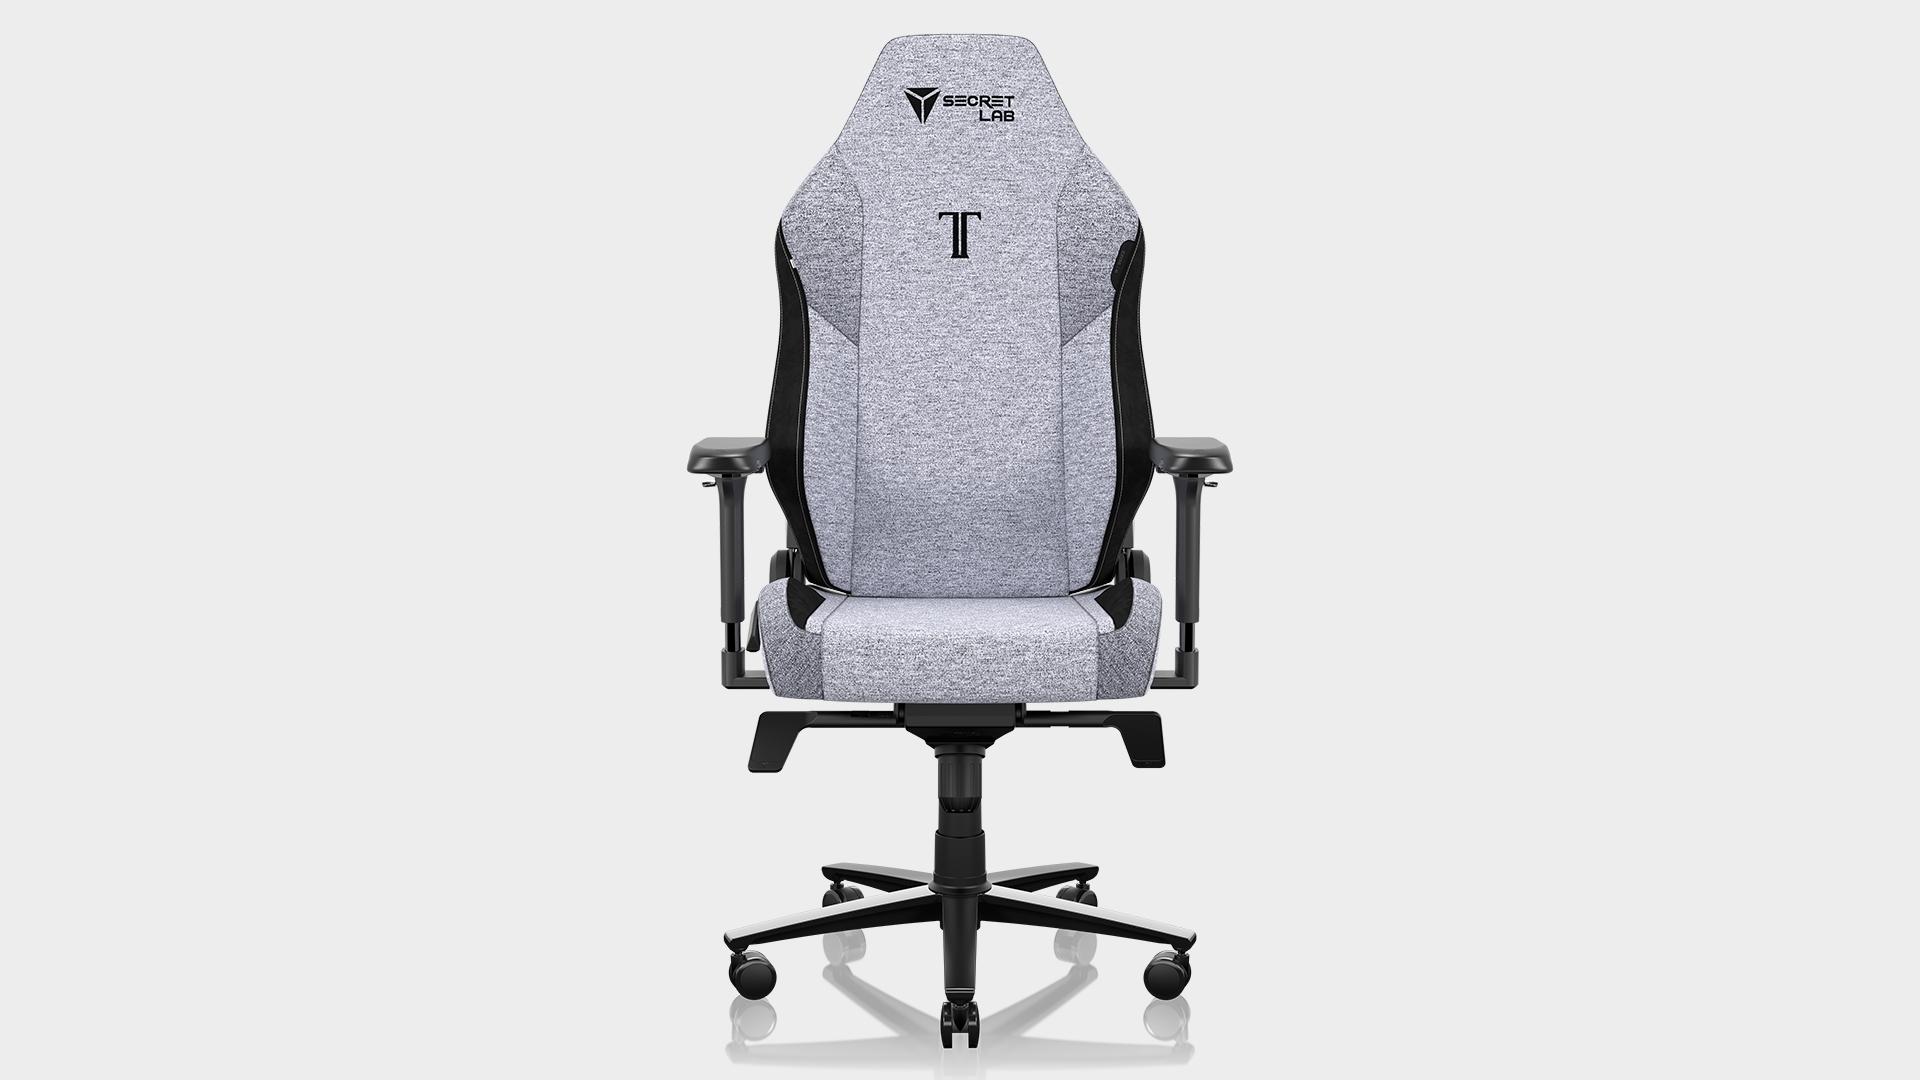 Secretlab Titan Evo 2022 gaming chair in multiple colours